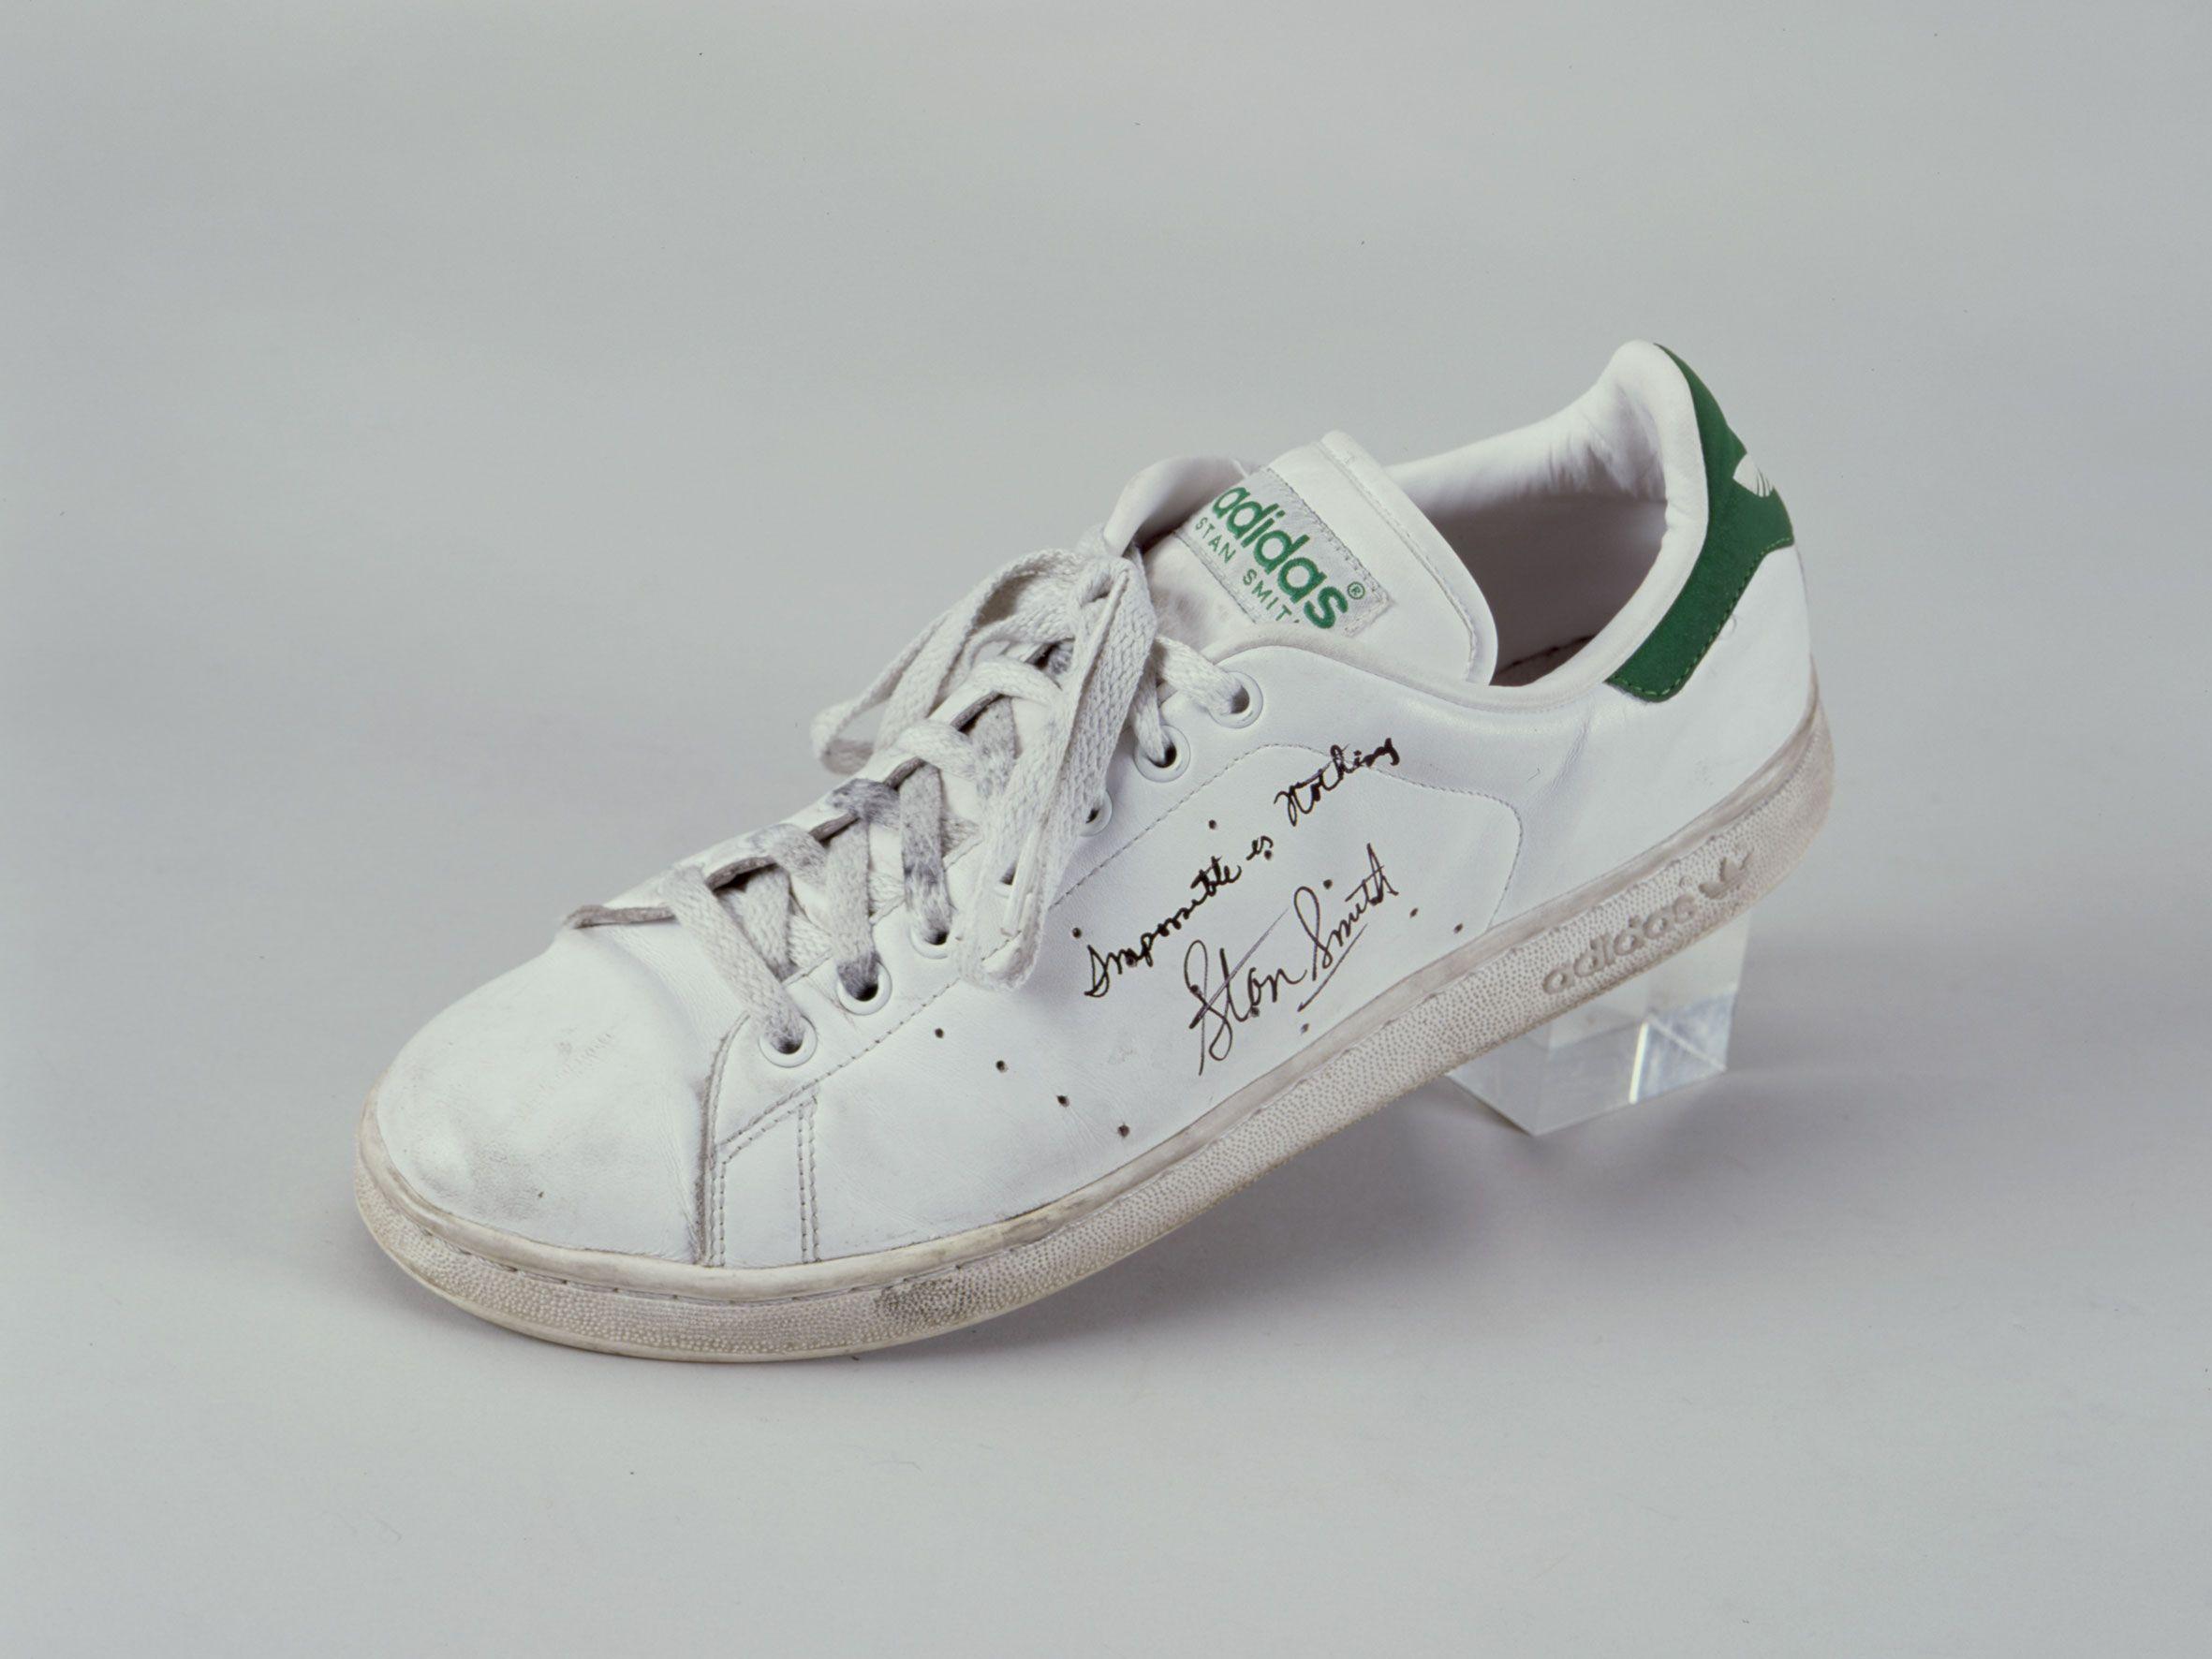 Chaussure Stan Smith d'Adidas dédicacée par Stan Smith, 1970 (collection  MNS)